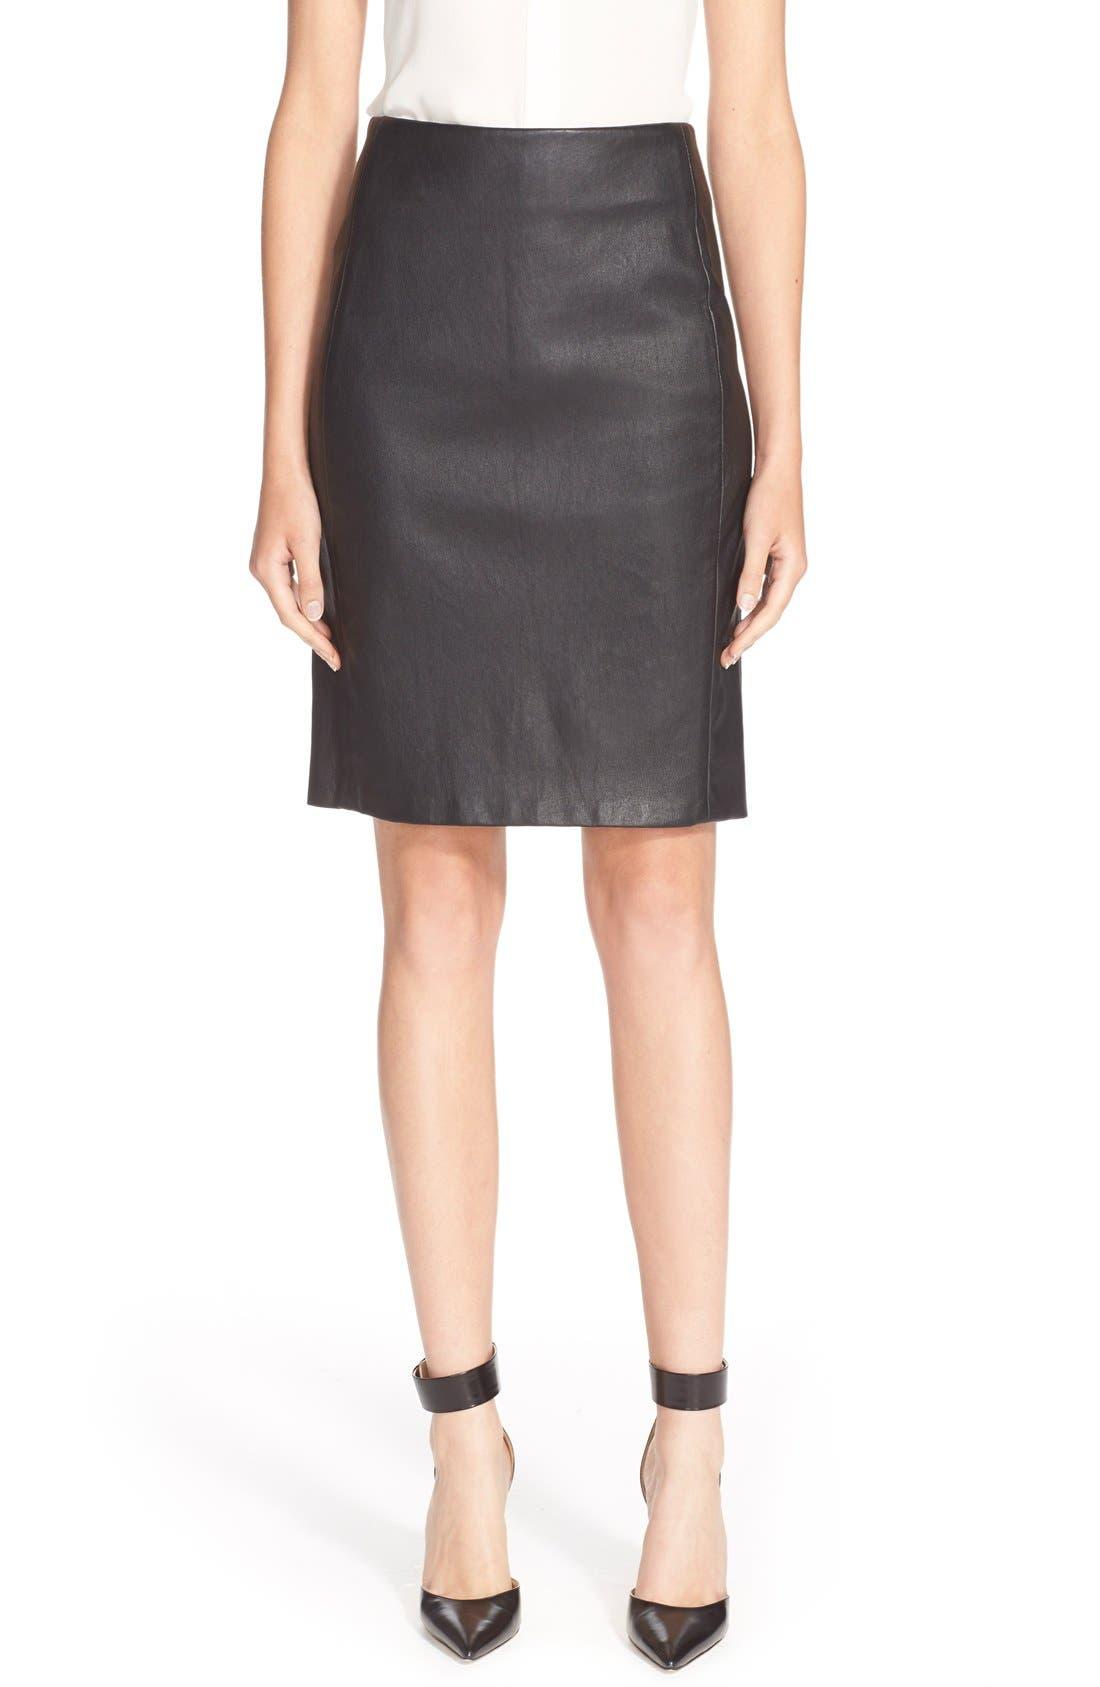 Main Image - Diane vonFurstenberg'Cloe' Leather Pencil Skirt